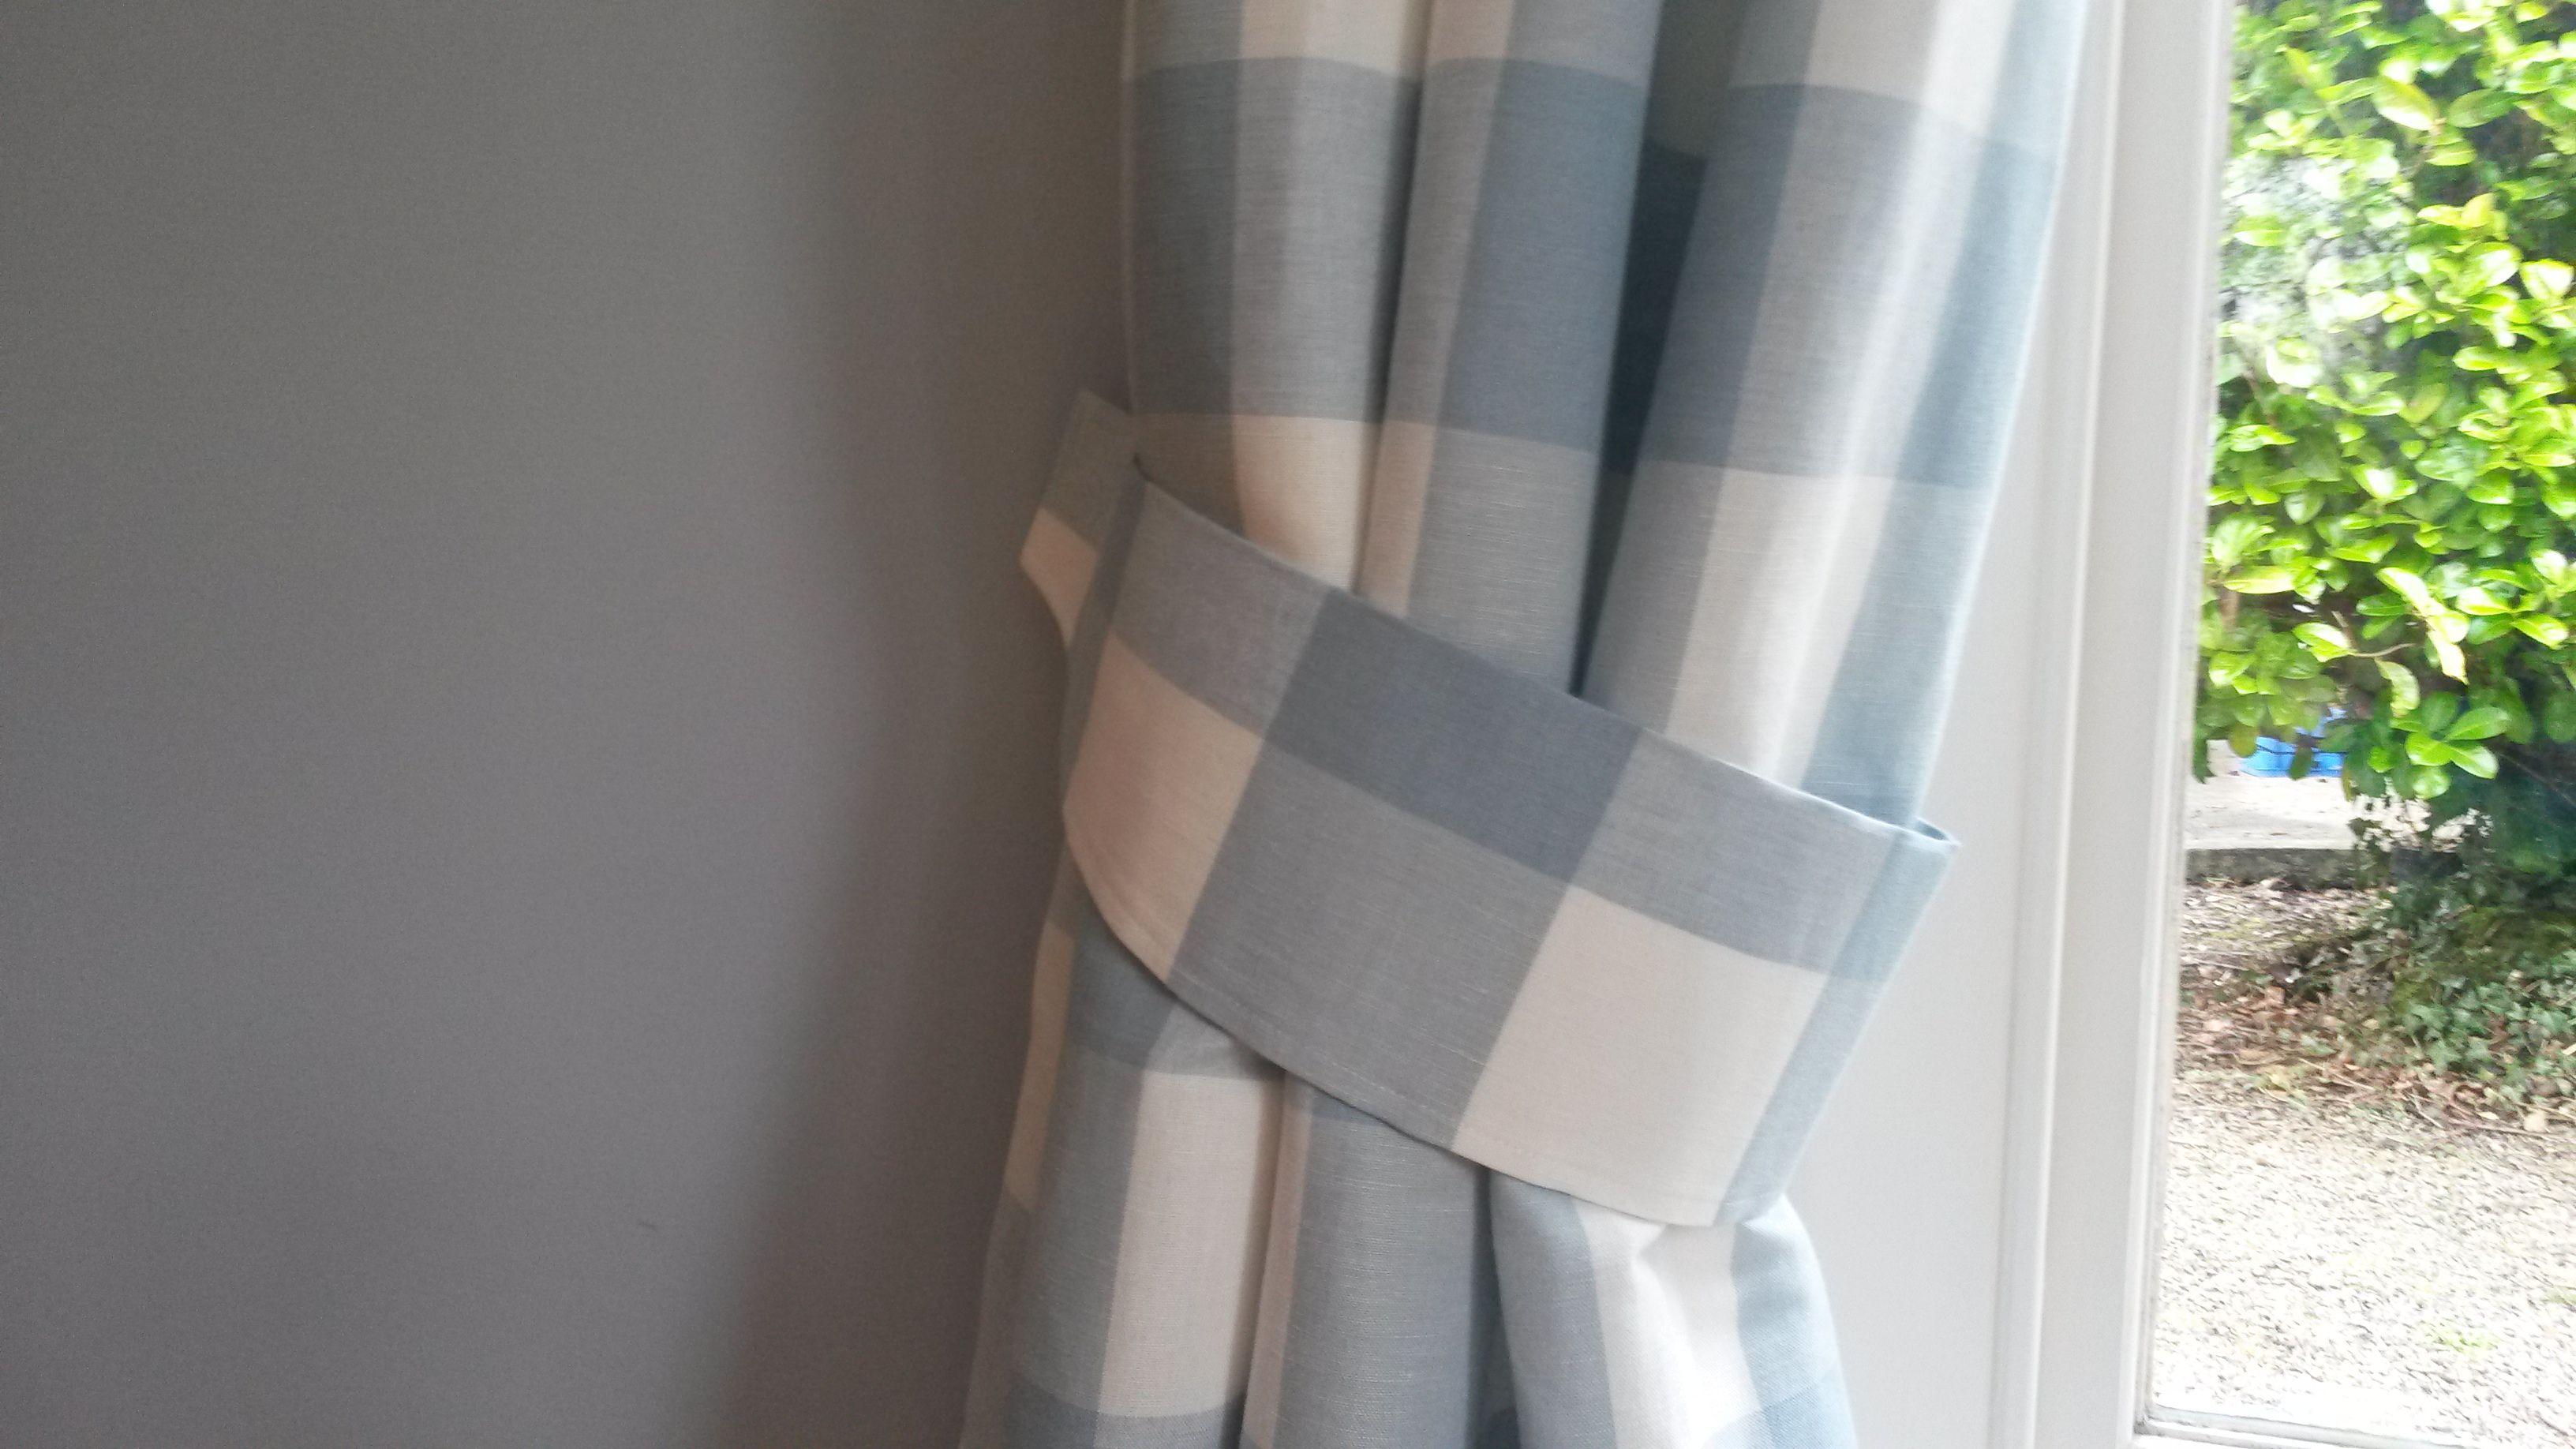 Awesome Diy Curtain Tiebacks Very Good Tutorial From